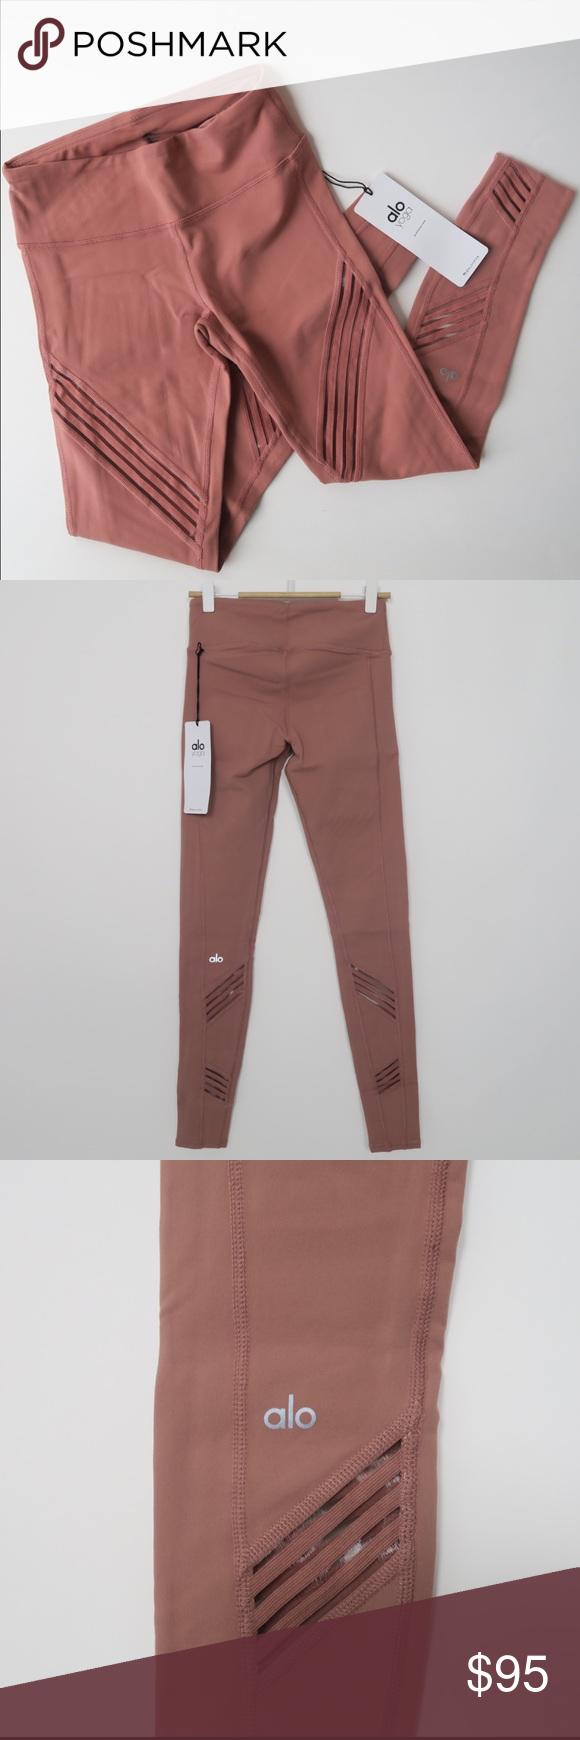 f4cc661935 ALO yoga Multi legging Rosewater Leggings NEW, XS Brand new with tag,  color: Rosewater (like pastel dark peach), XS. 100% Authentic. ALO Yoga  Pants Leggings